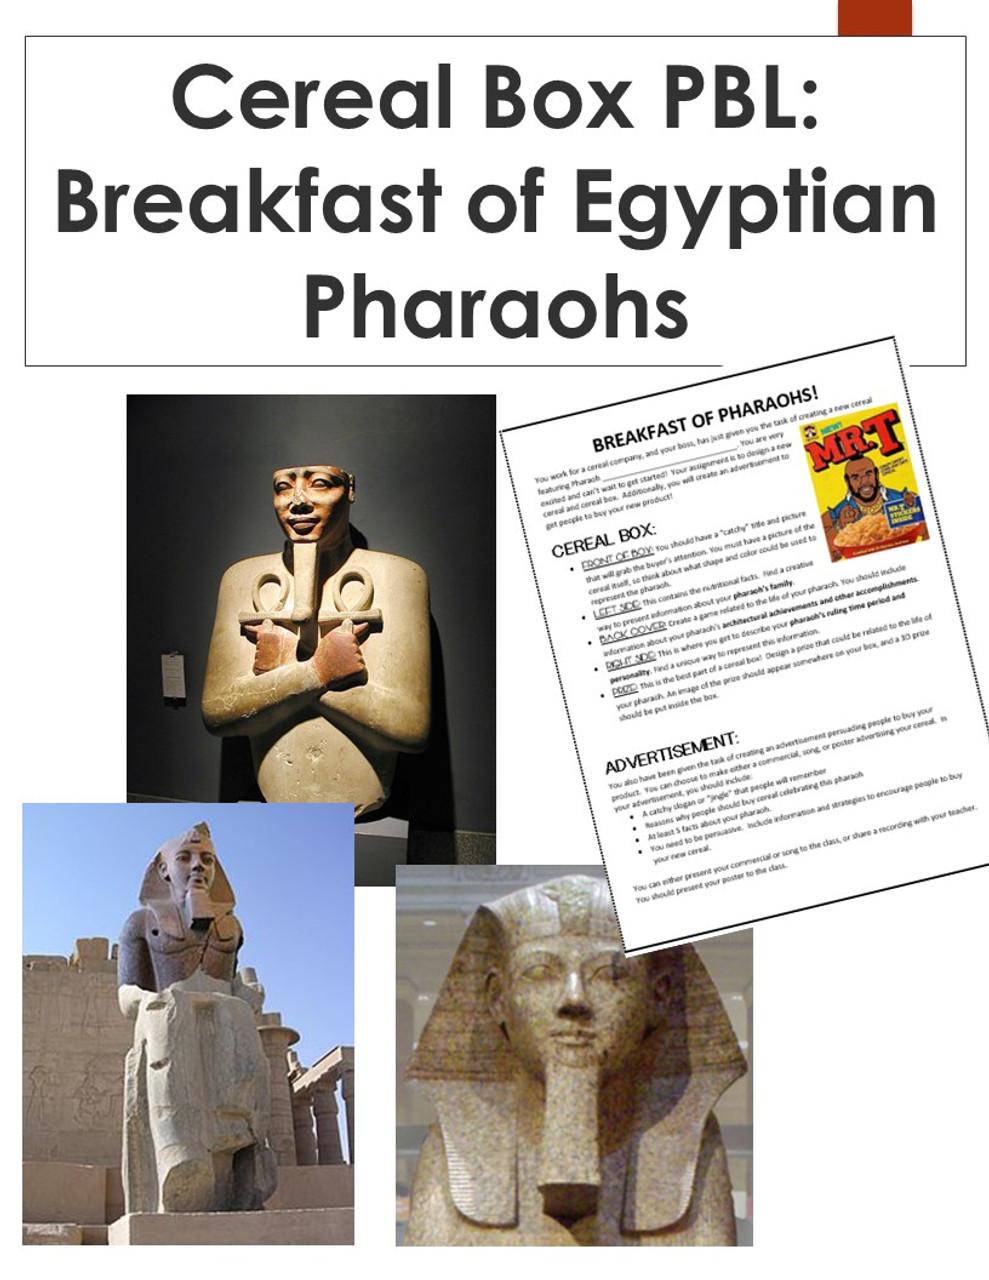 Breakfast of Egyptian Pharaohs: Cereal Box PBL